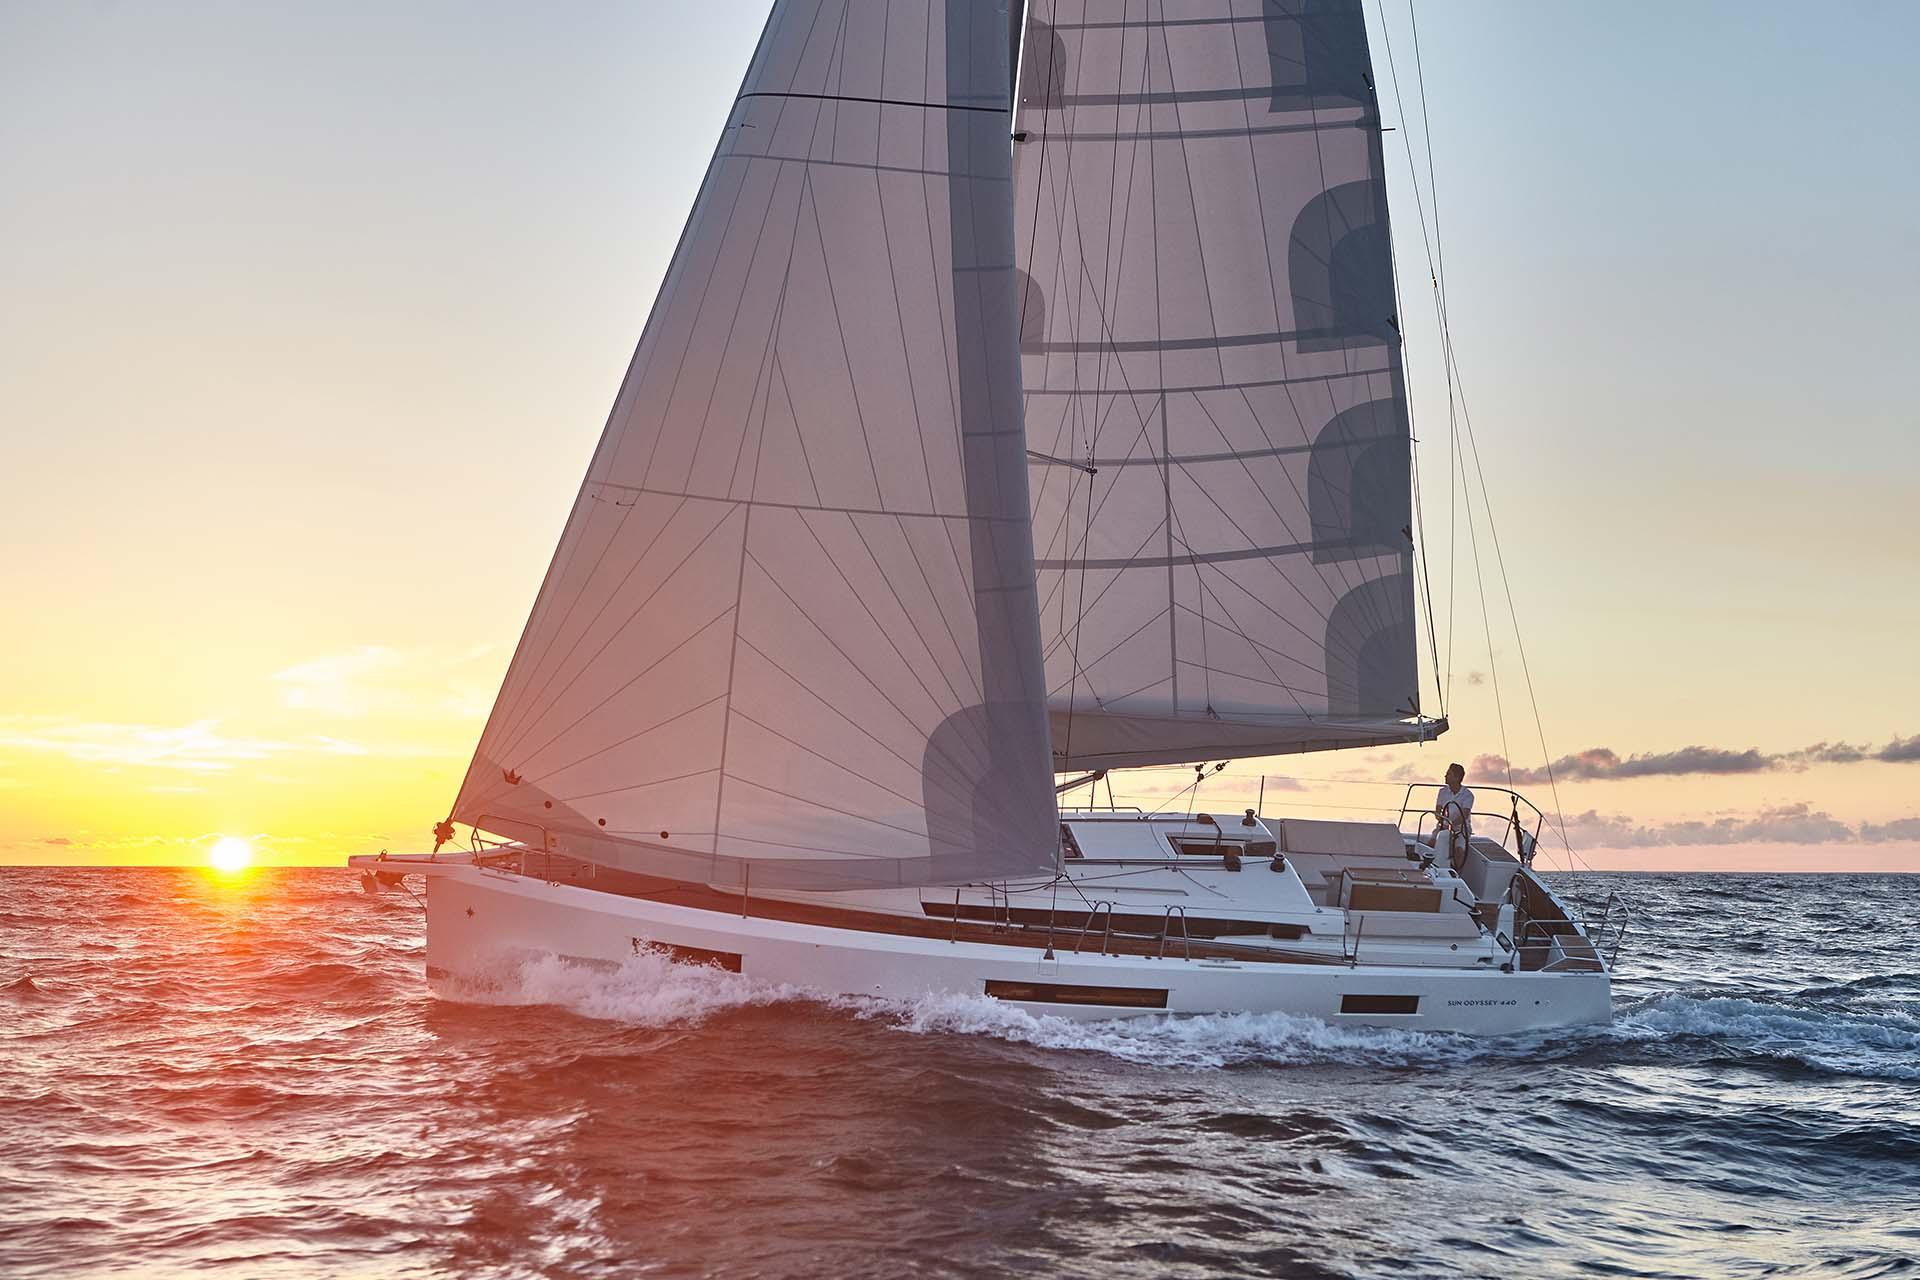 Jeanneau 440 Sailing